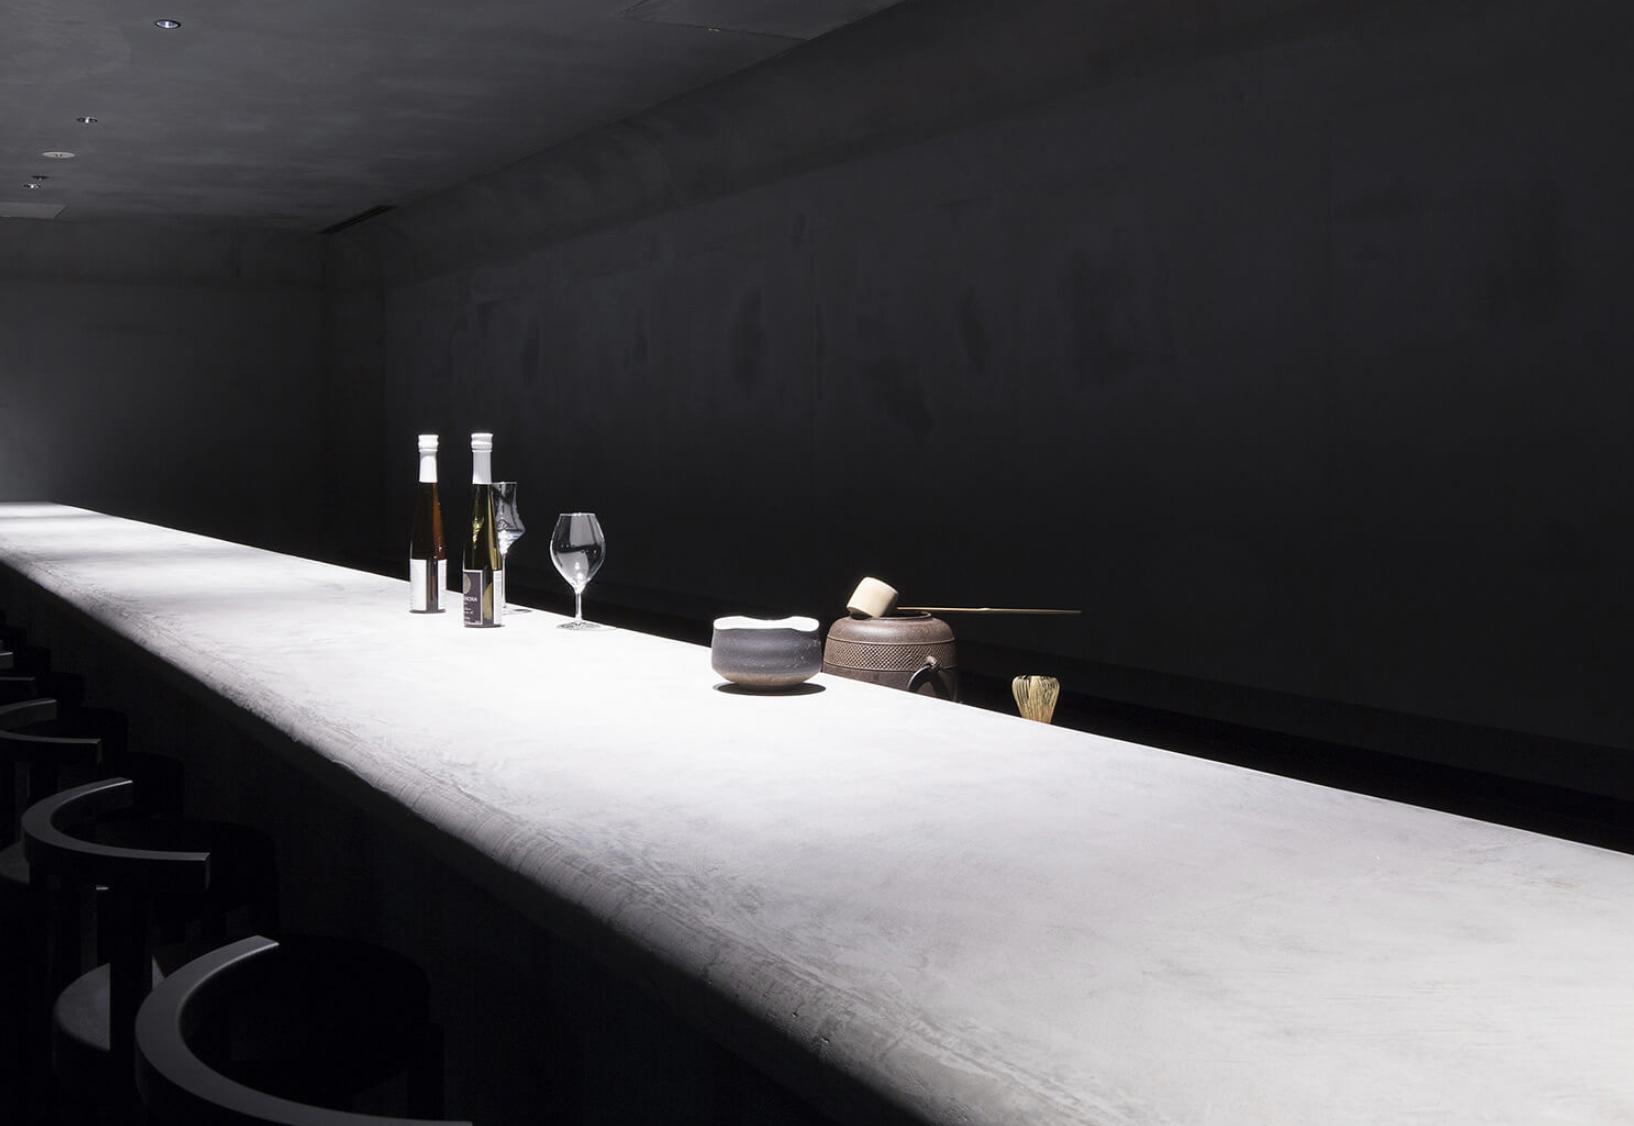 SLEEP_  KOE.  #Art #Music #Food #Design #Minimalistic #Japanese   http://hotelkoe.com/stayandart/